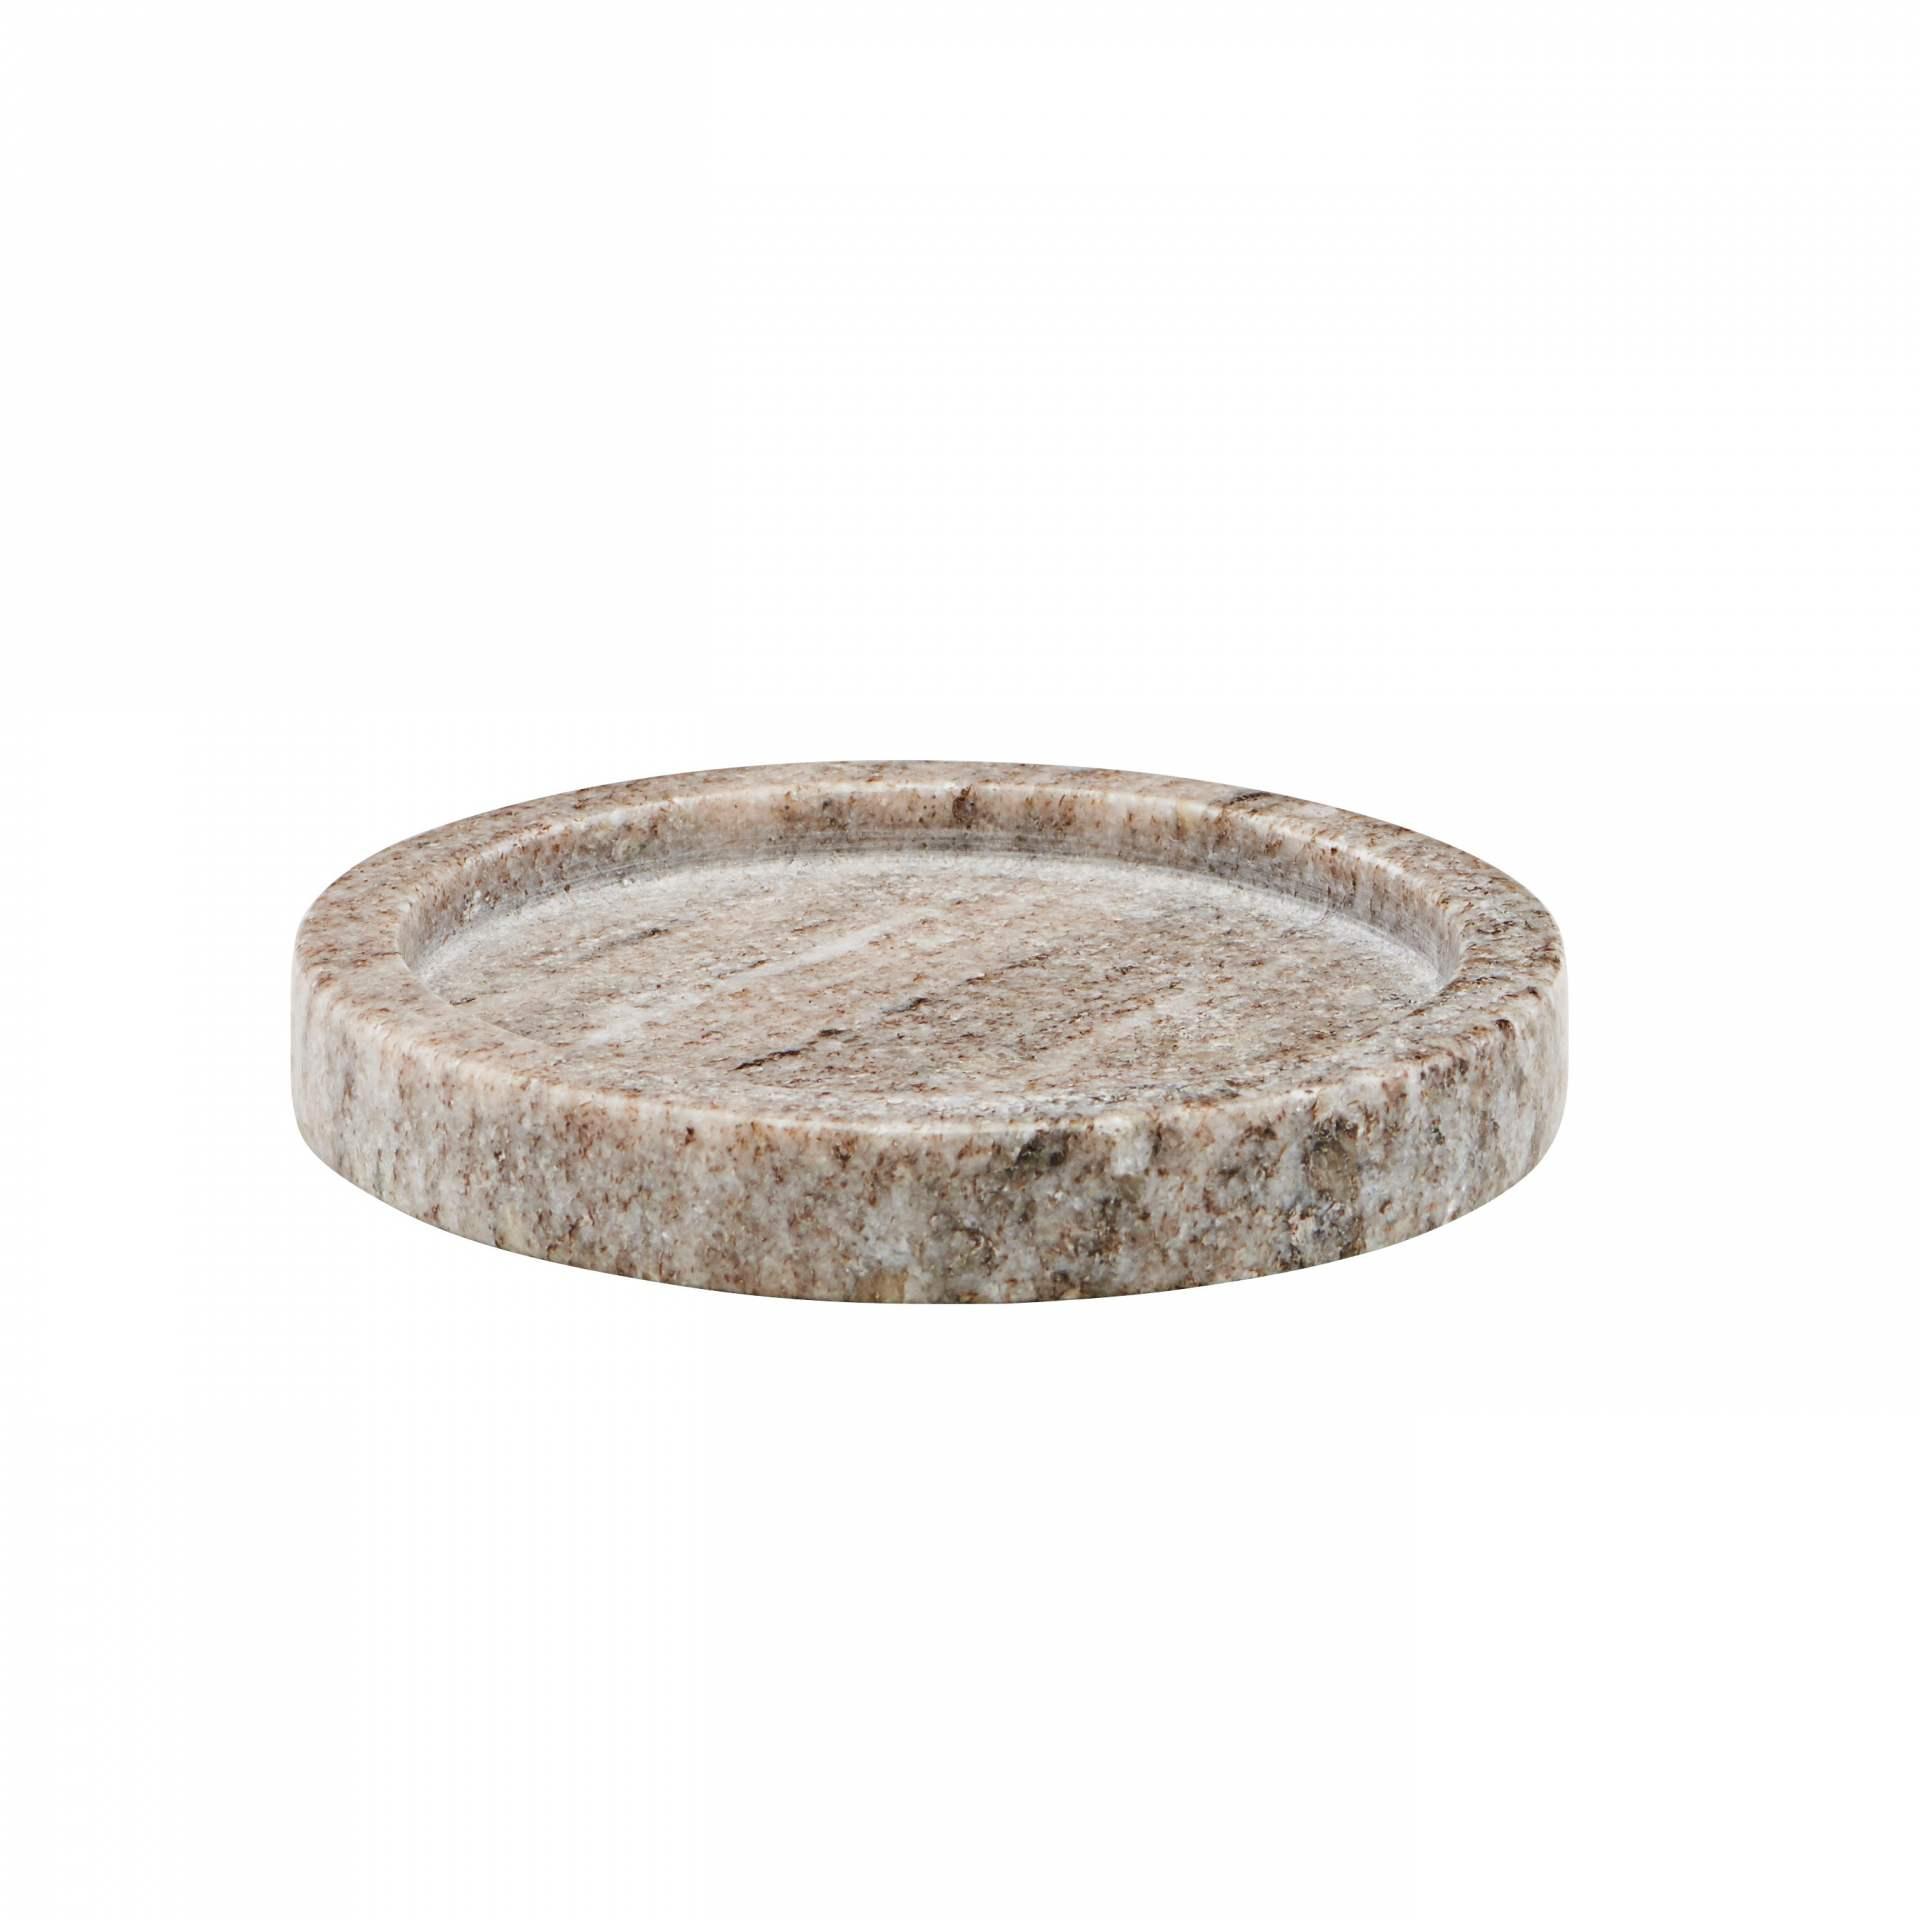 meraki Mramorový tácek Beige 12,5cm, béžová barva, mramor